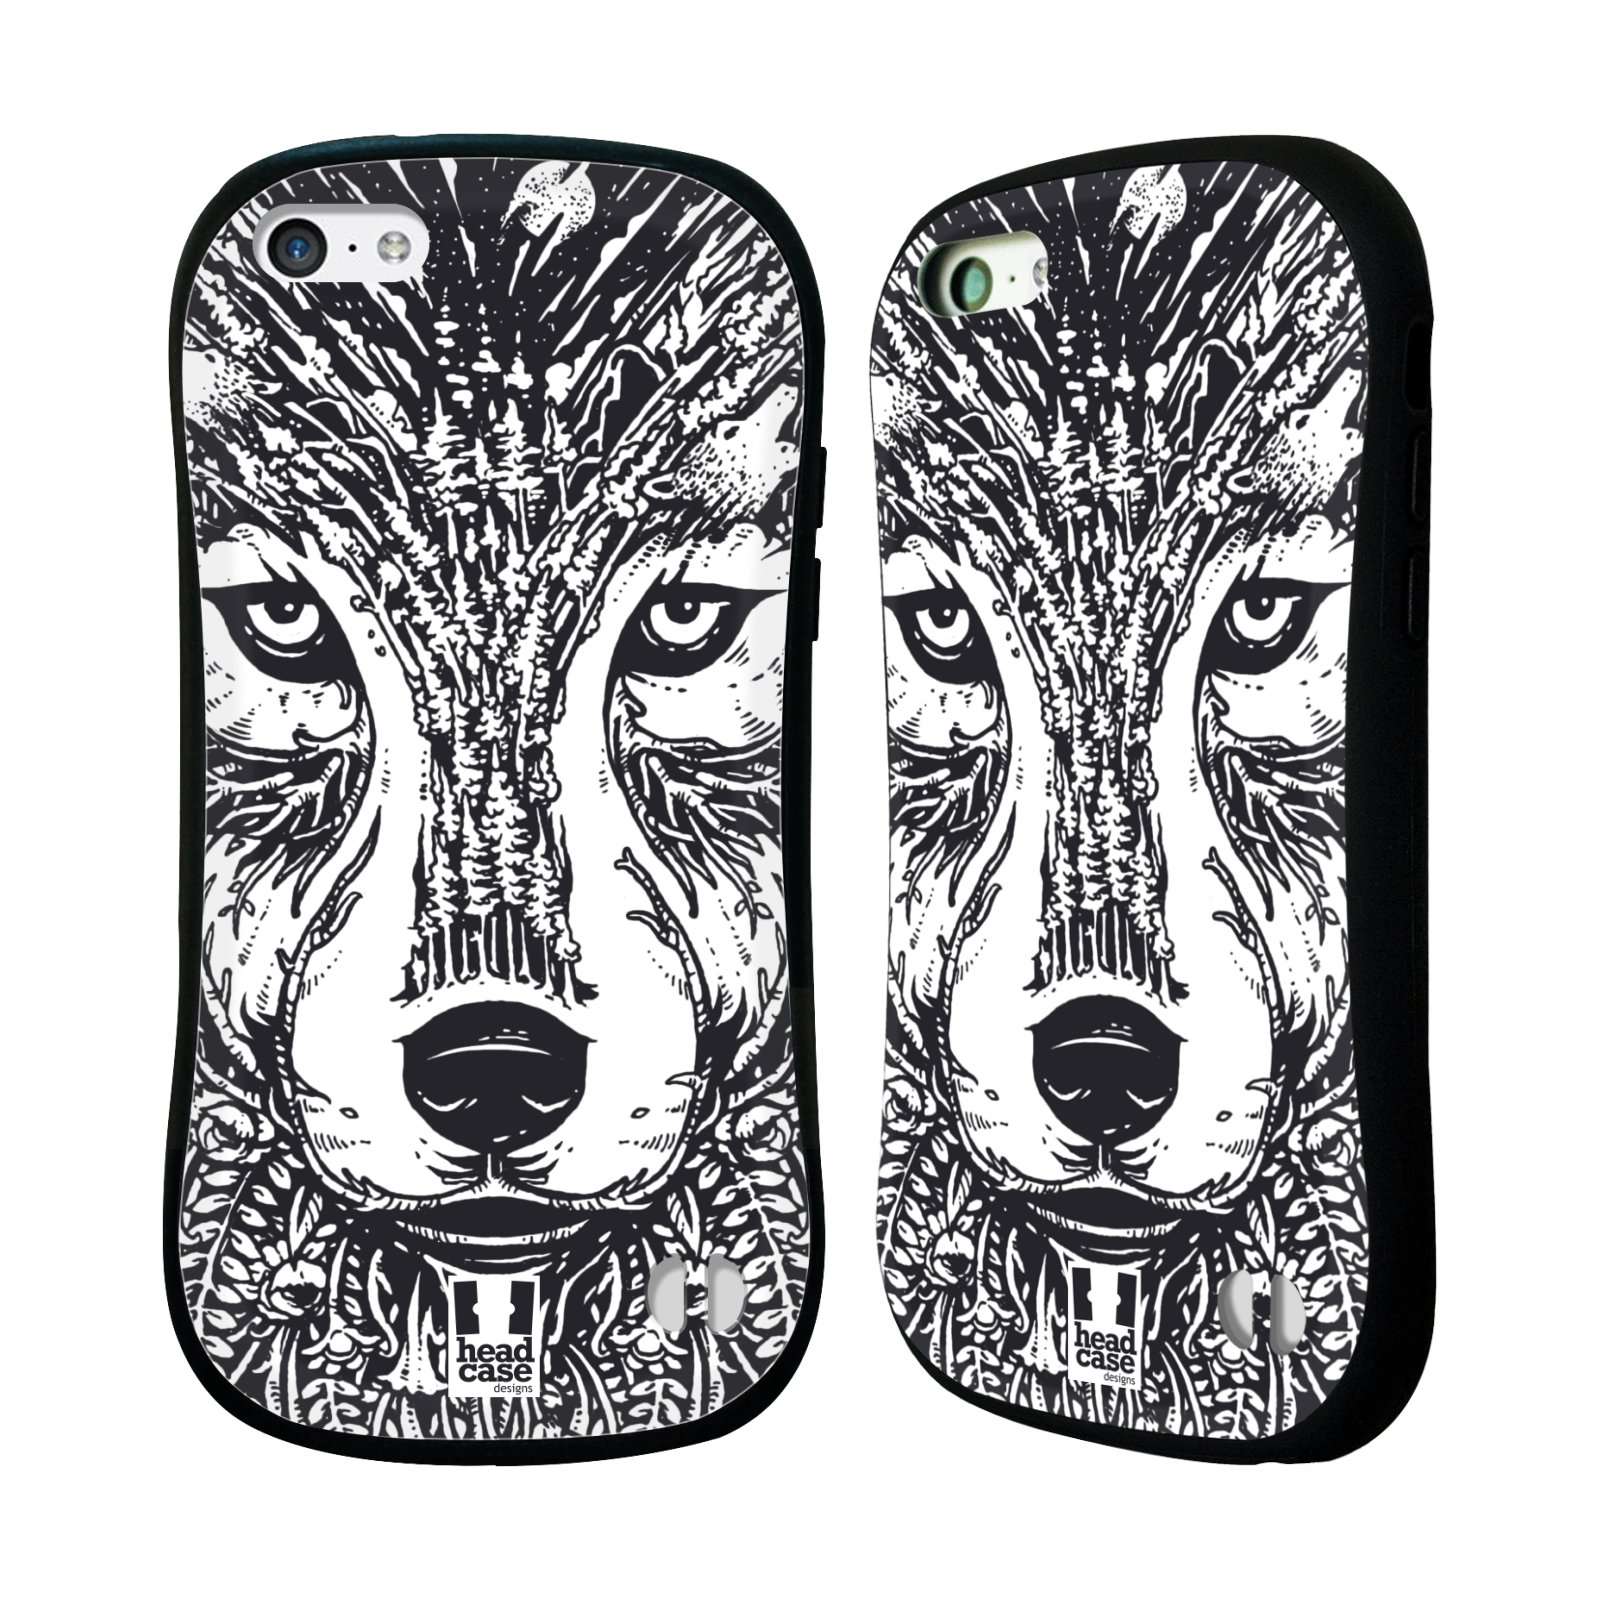 HEAD CASE DESIGNS DOODLE ANIMAL FACES HYBRID CASE FOR APPLE IPHONES PHONES